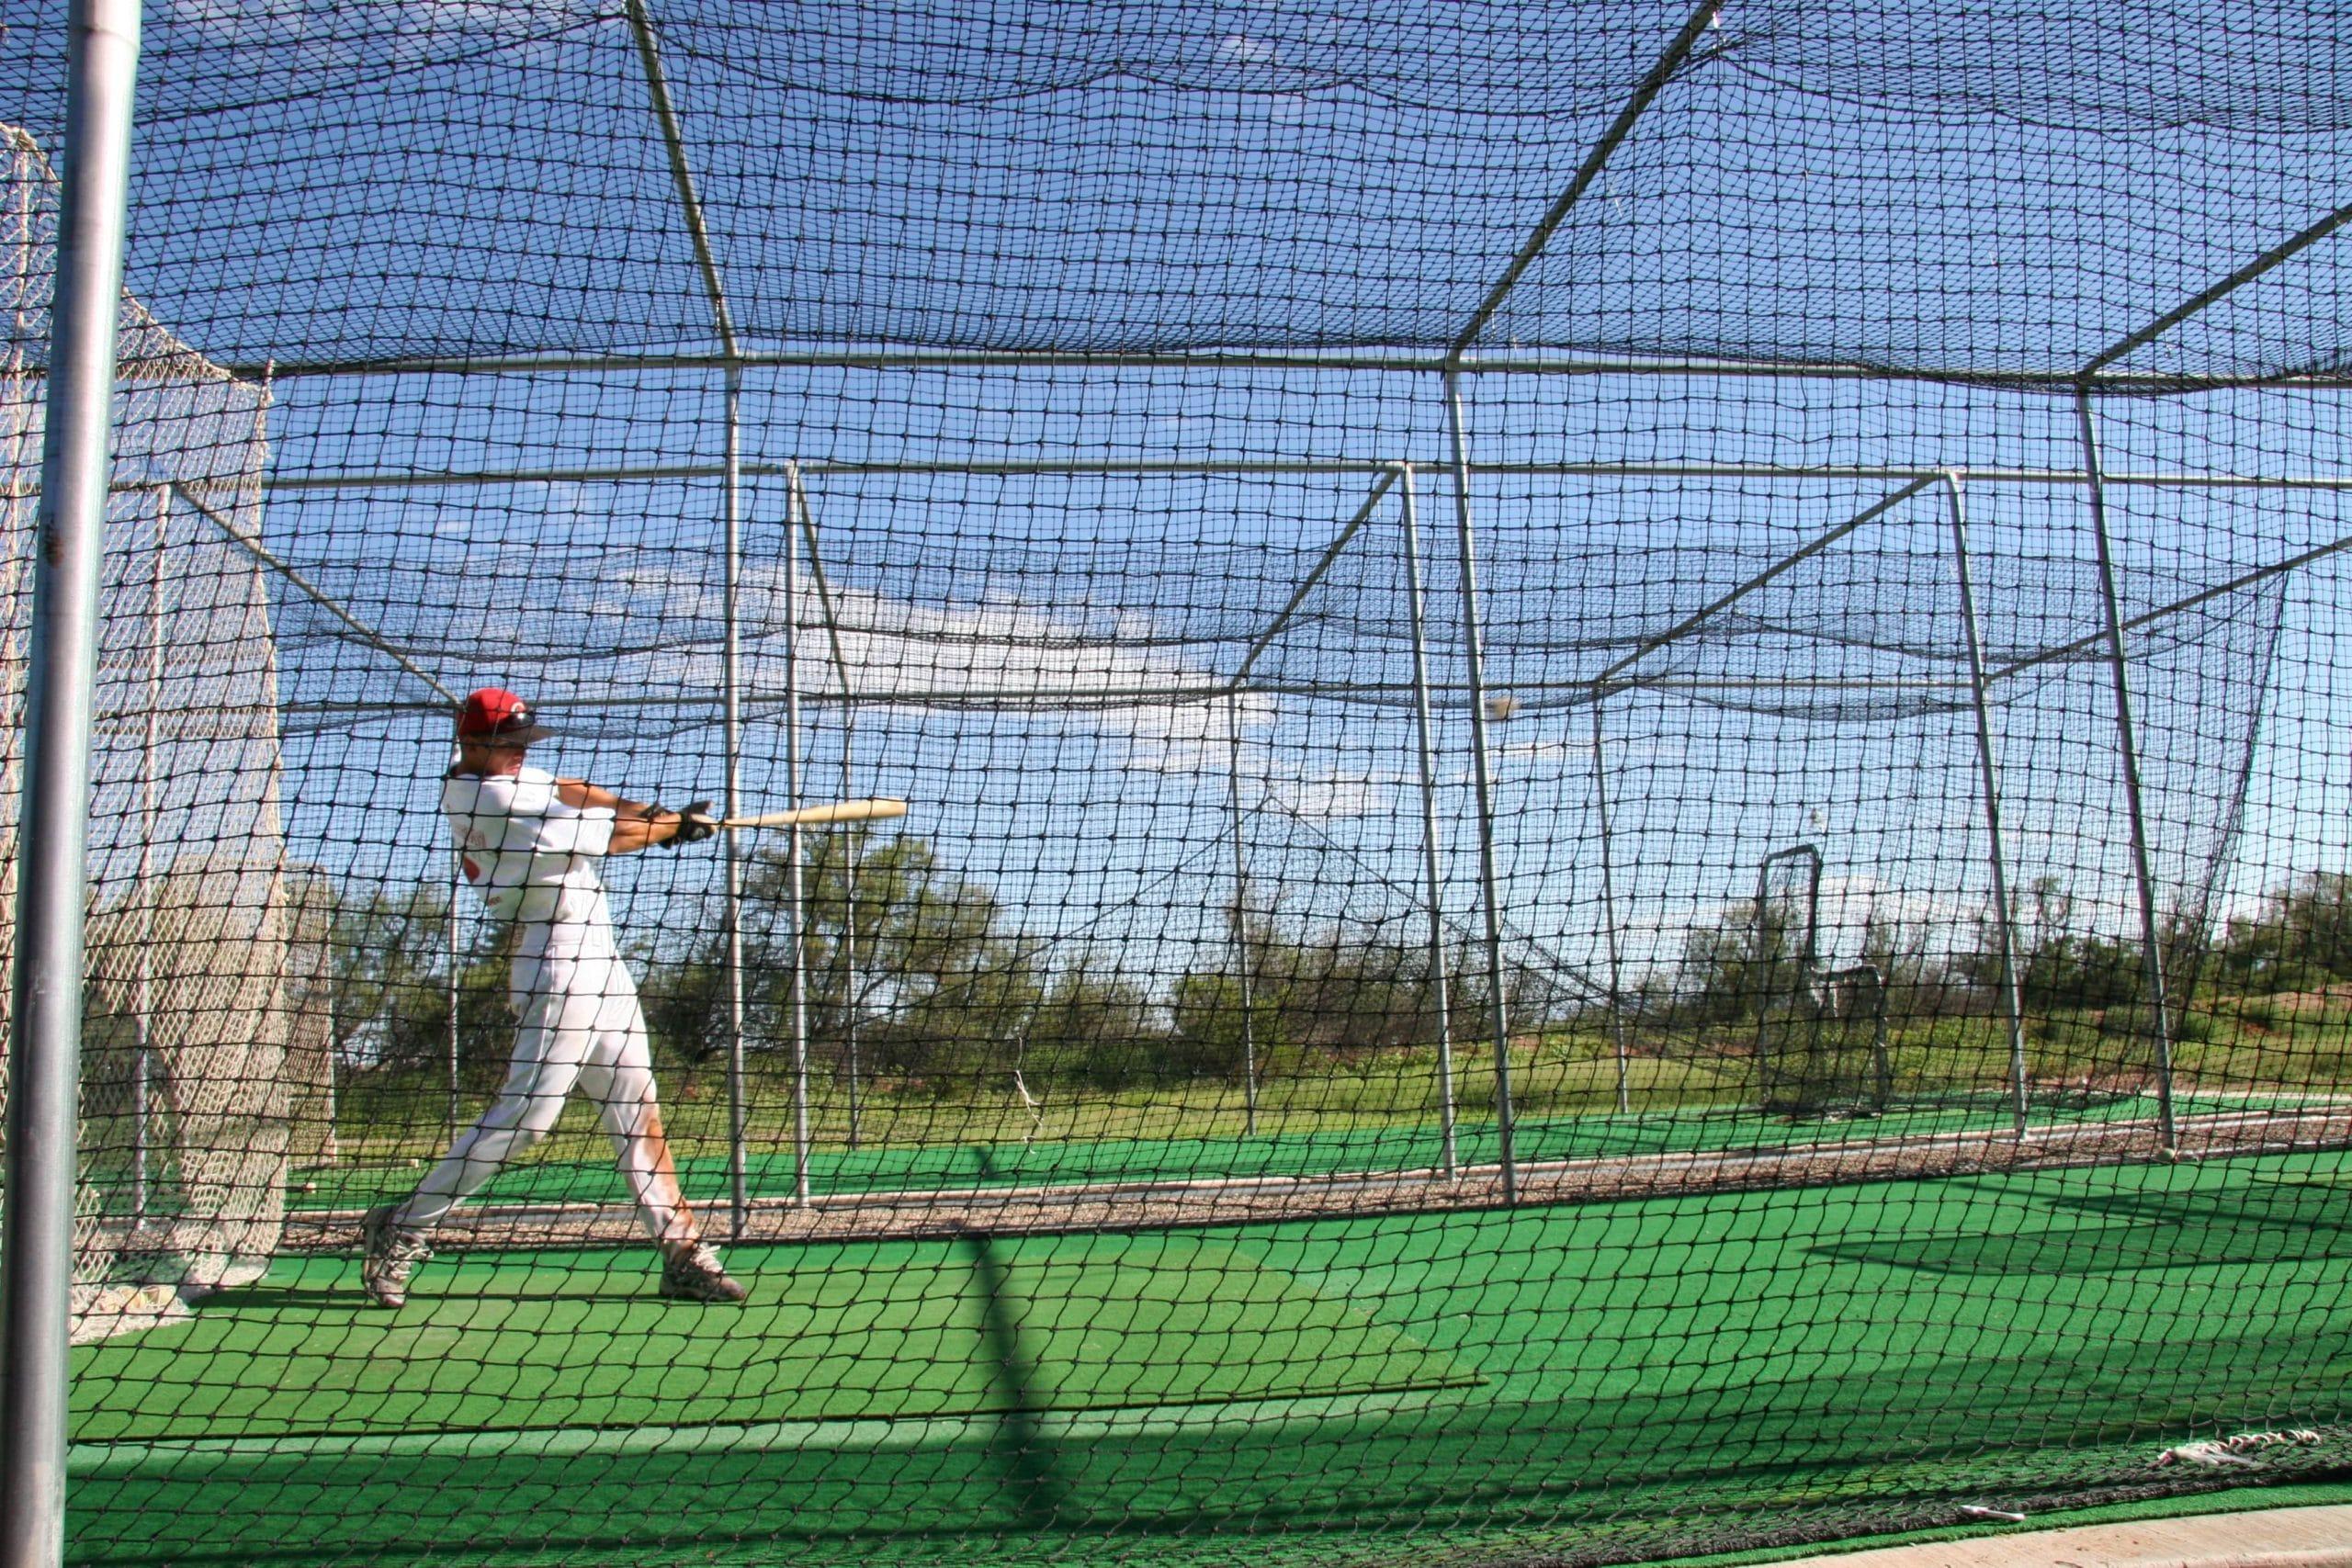 Basebal cage net